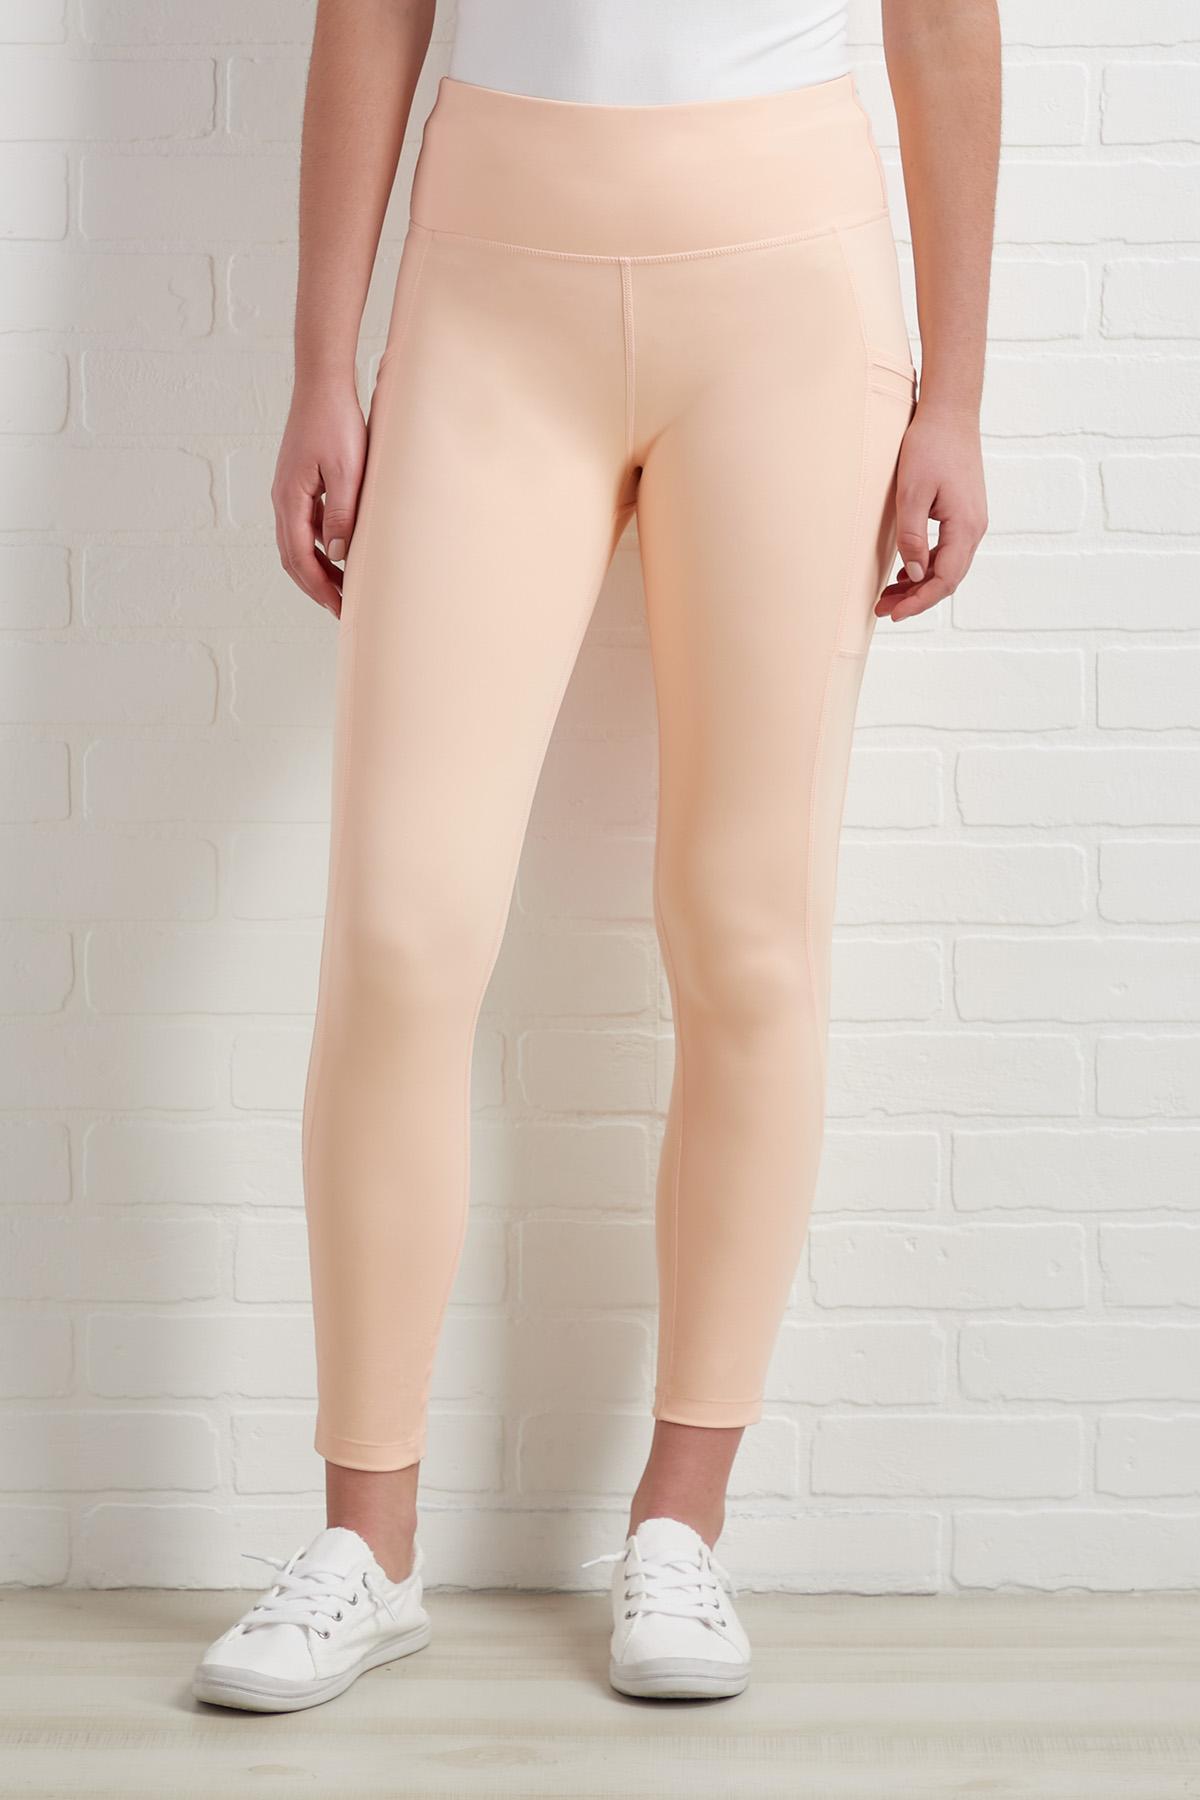 Georgia Peach Leggings